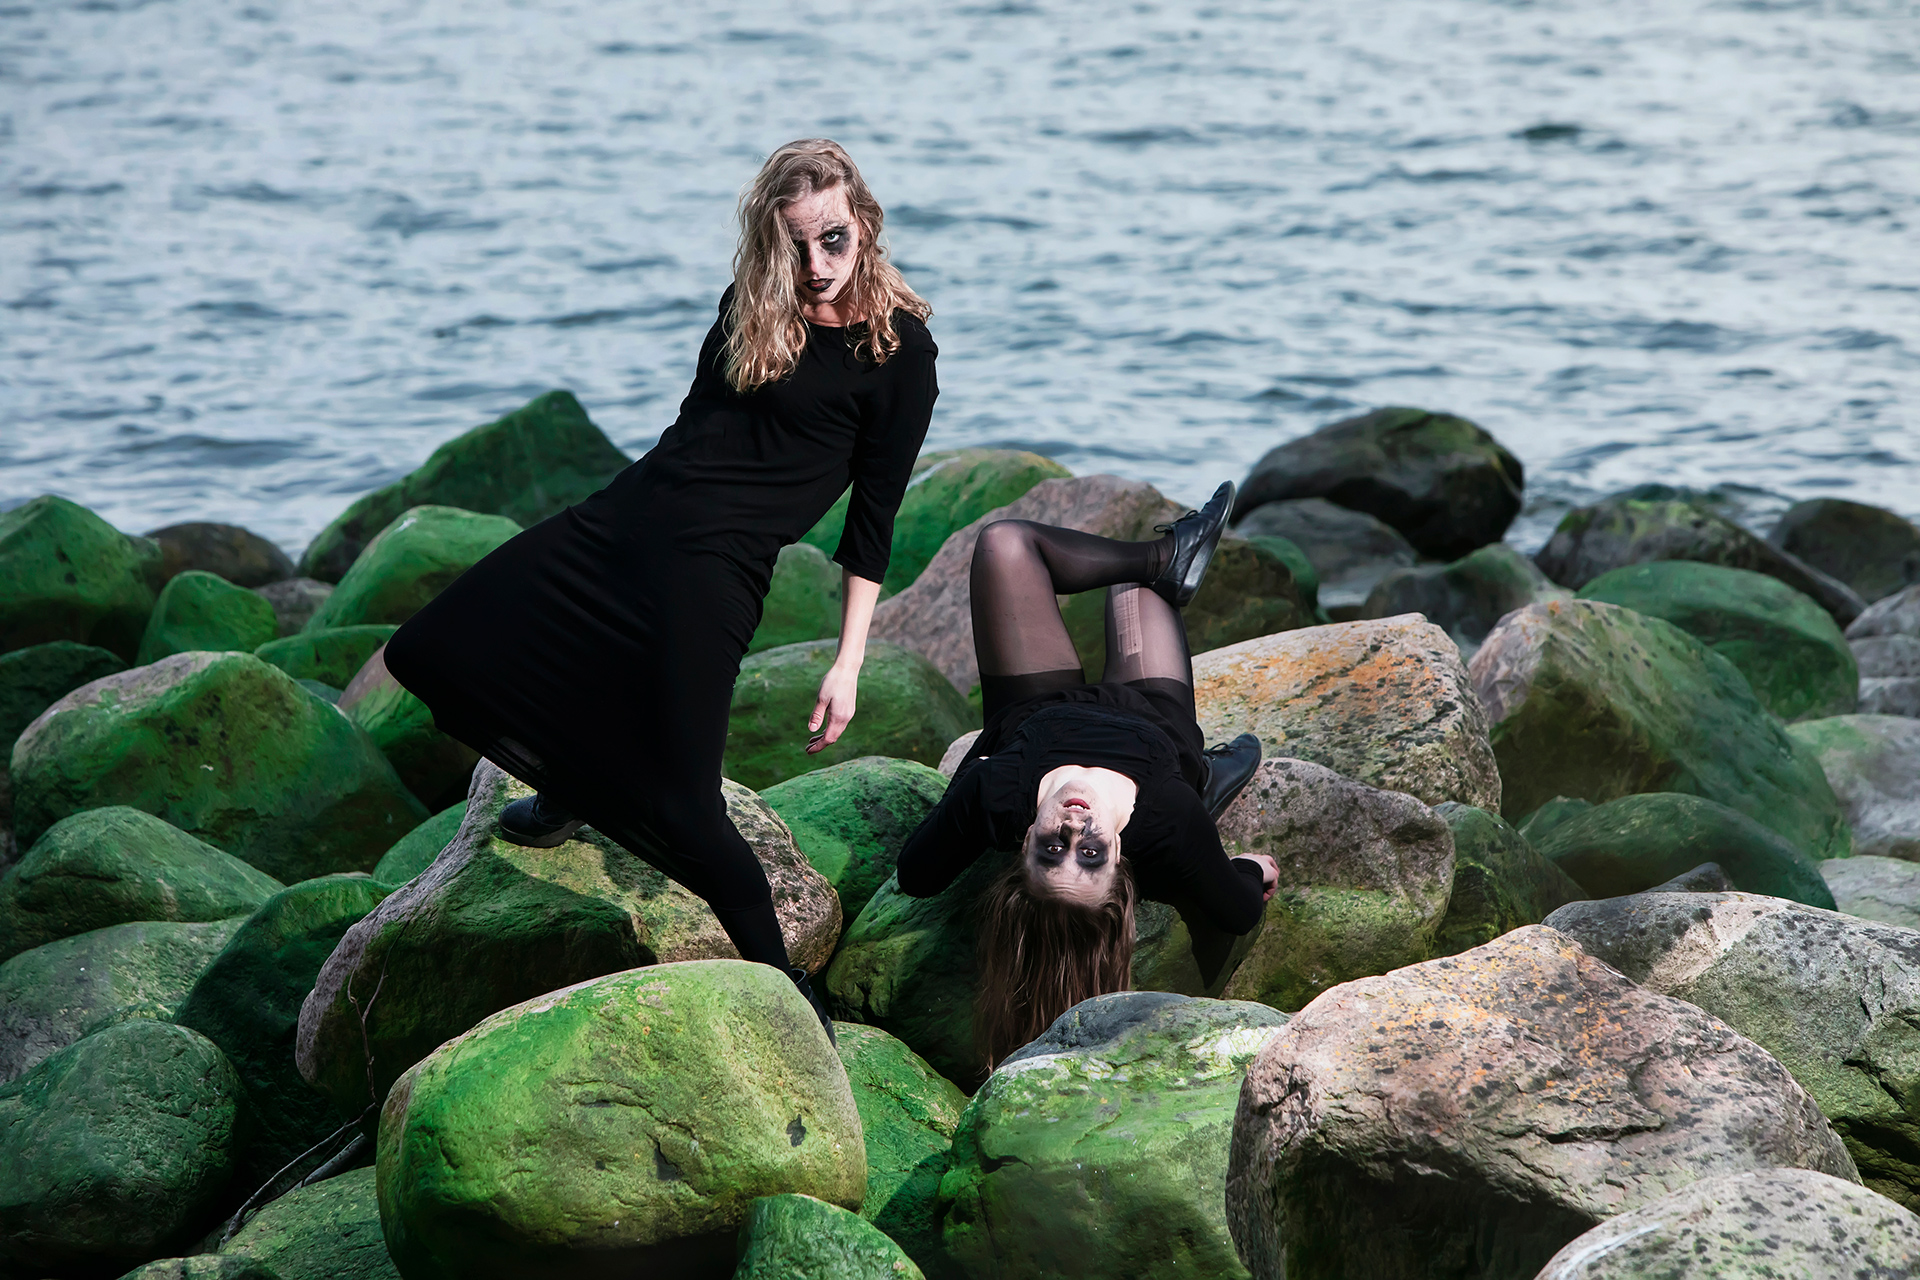 Sonia Haga, Stella Laine, Lauttasaari, Suomi, Finland, island, Helsinki, art, model, swan, daemon, dark, aesthetics, Baltic sea, green stones